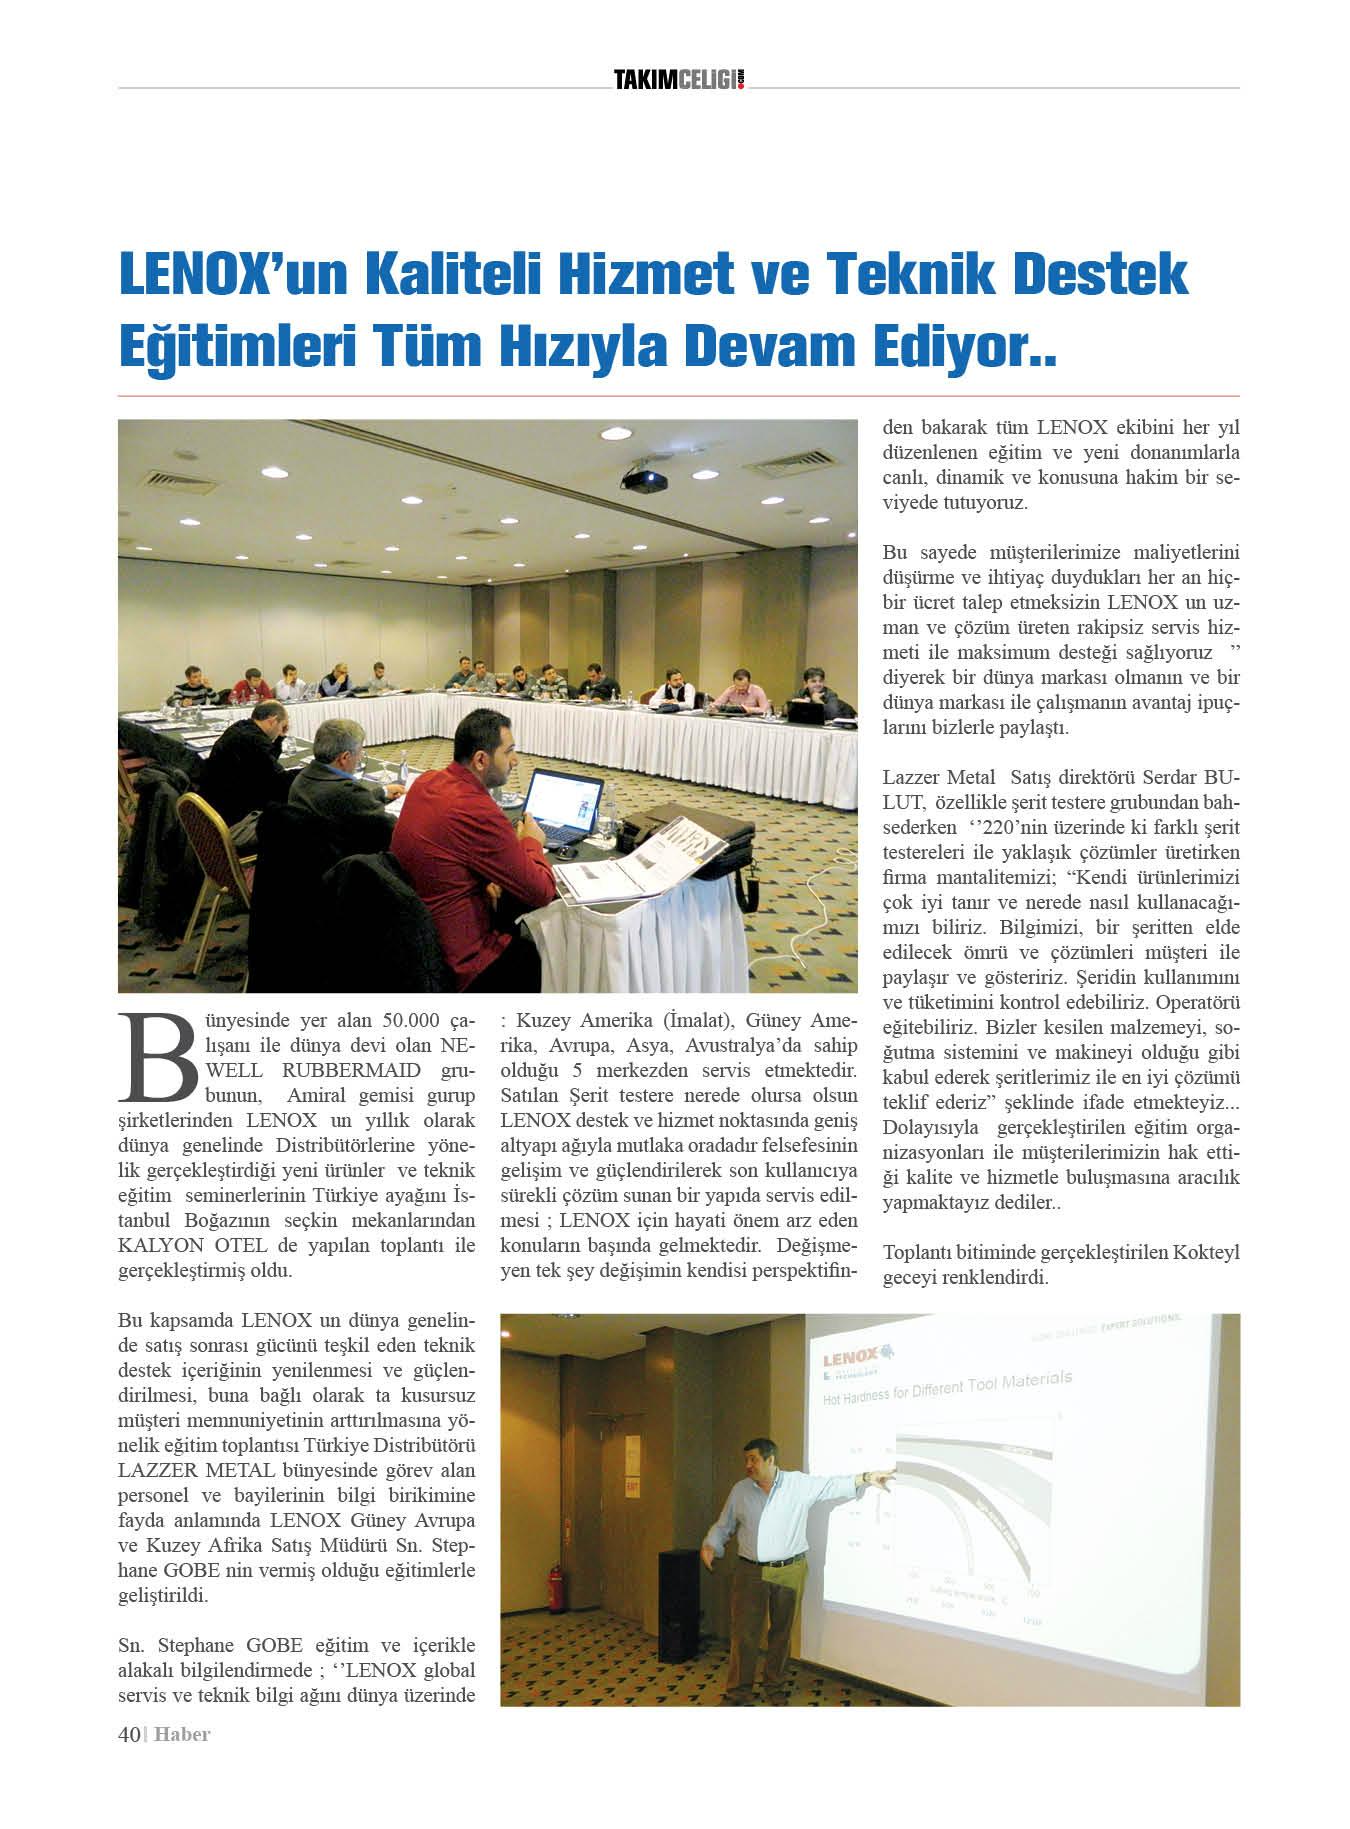 LazzerMetal_haber1